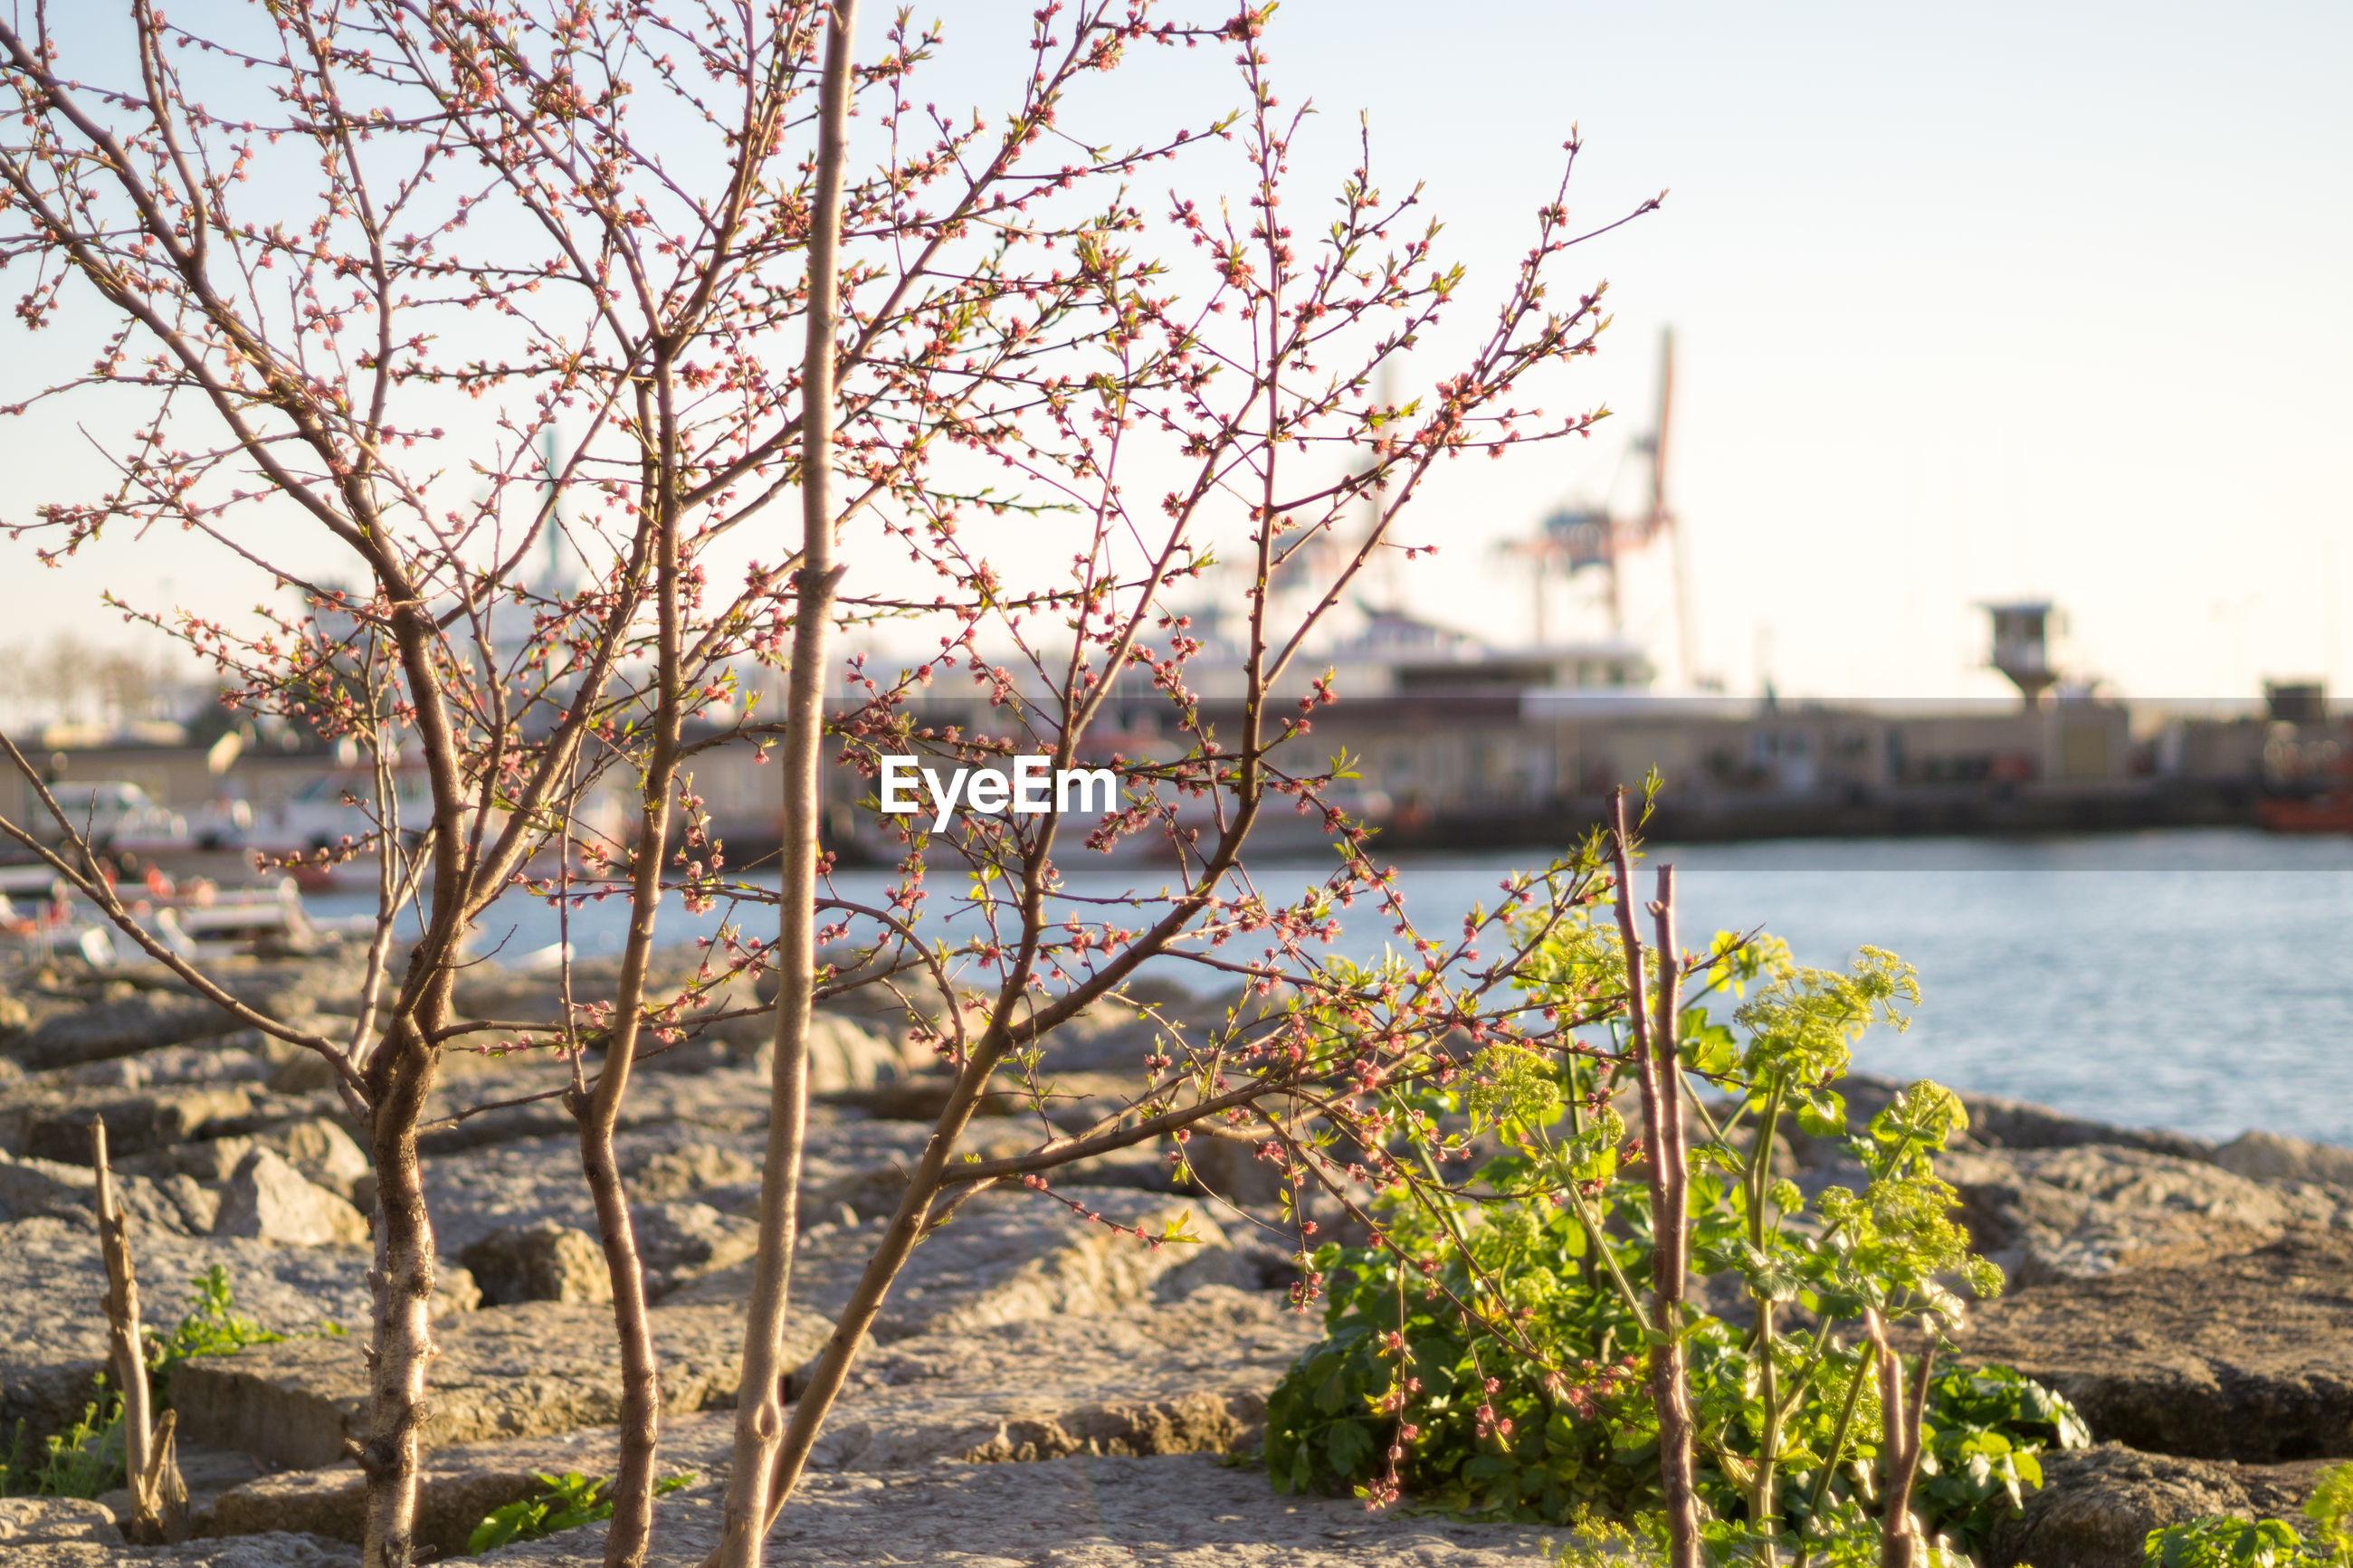 Trees growing in harbor